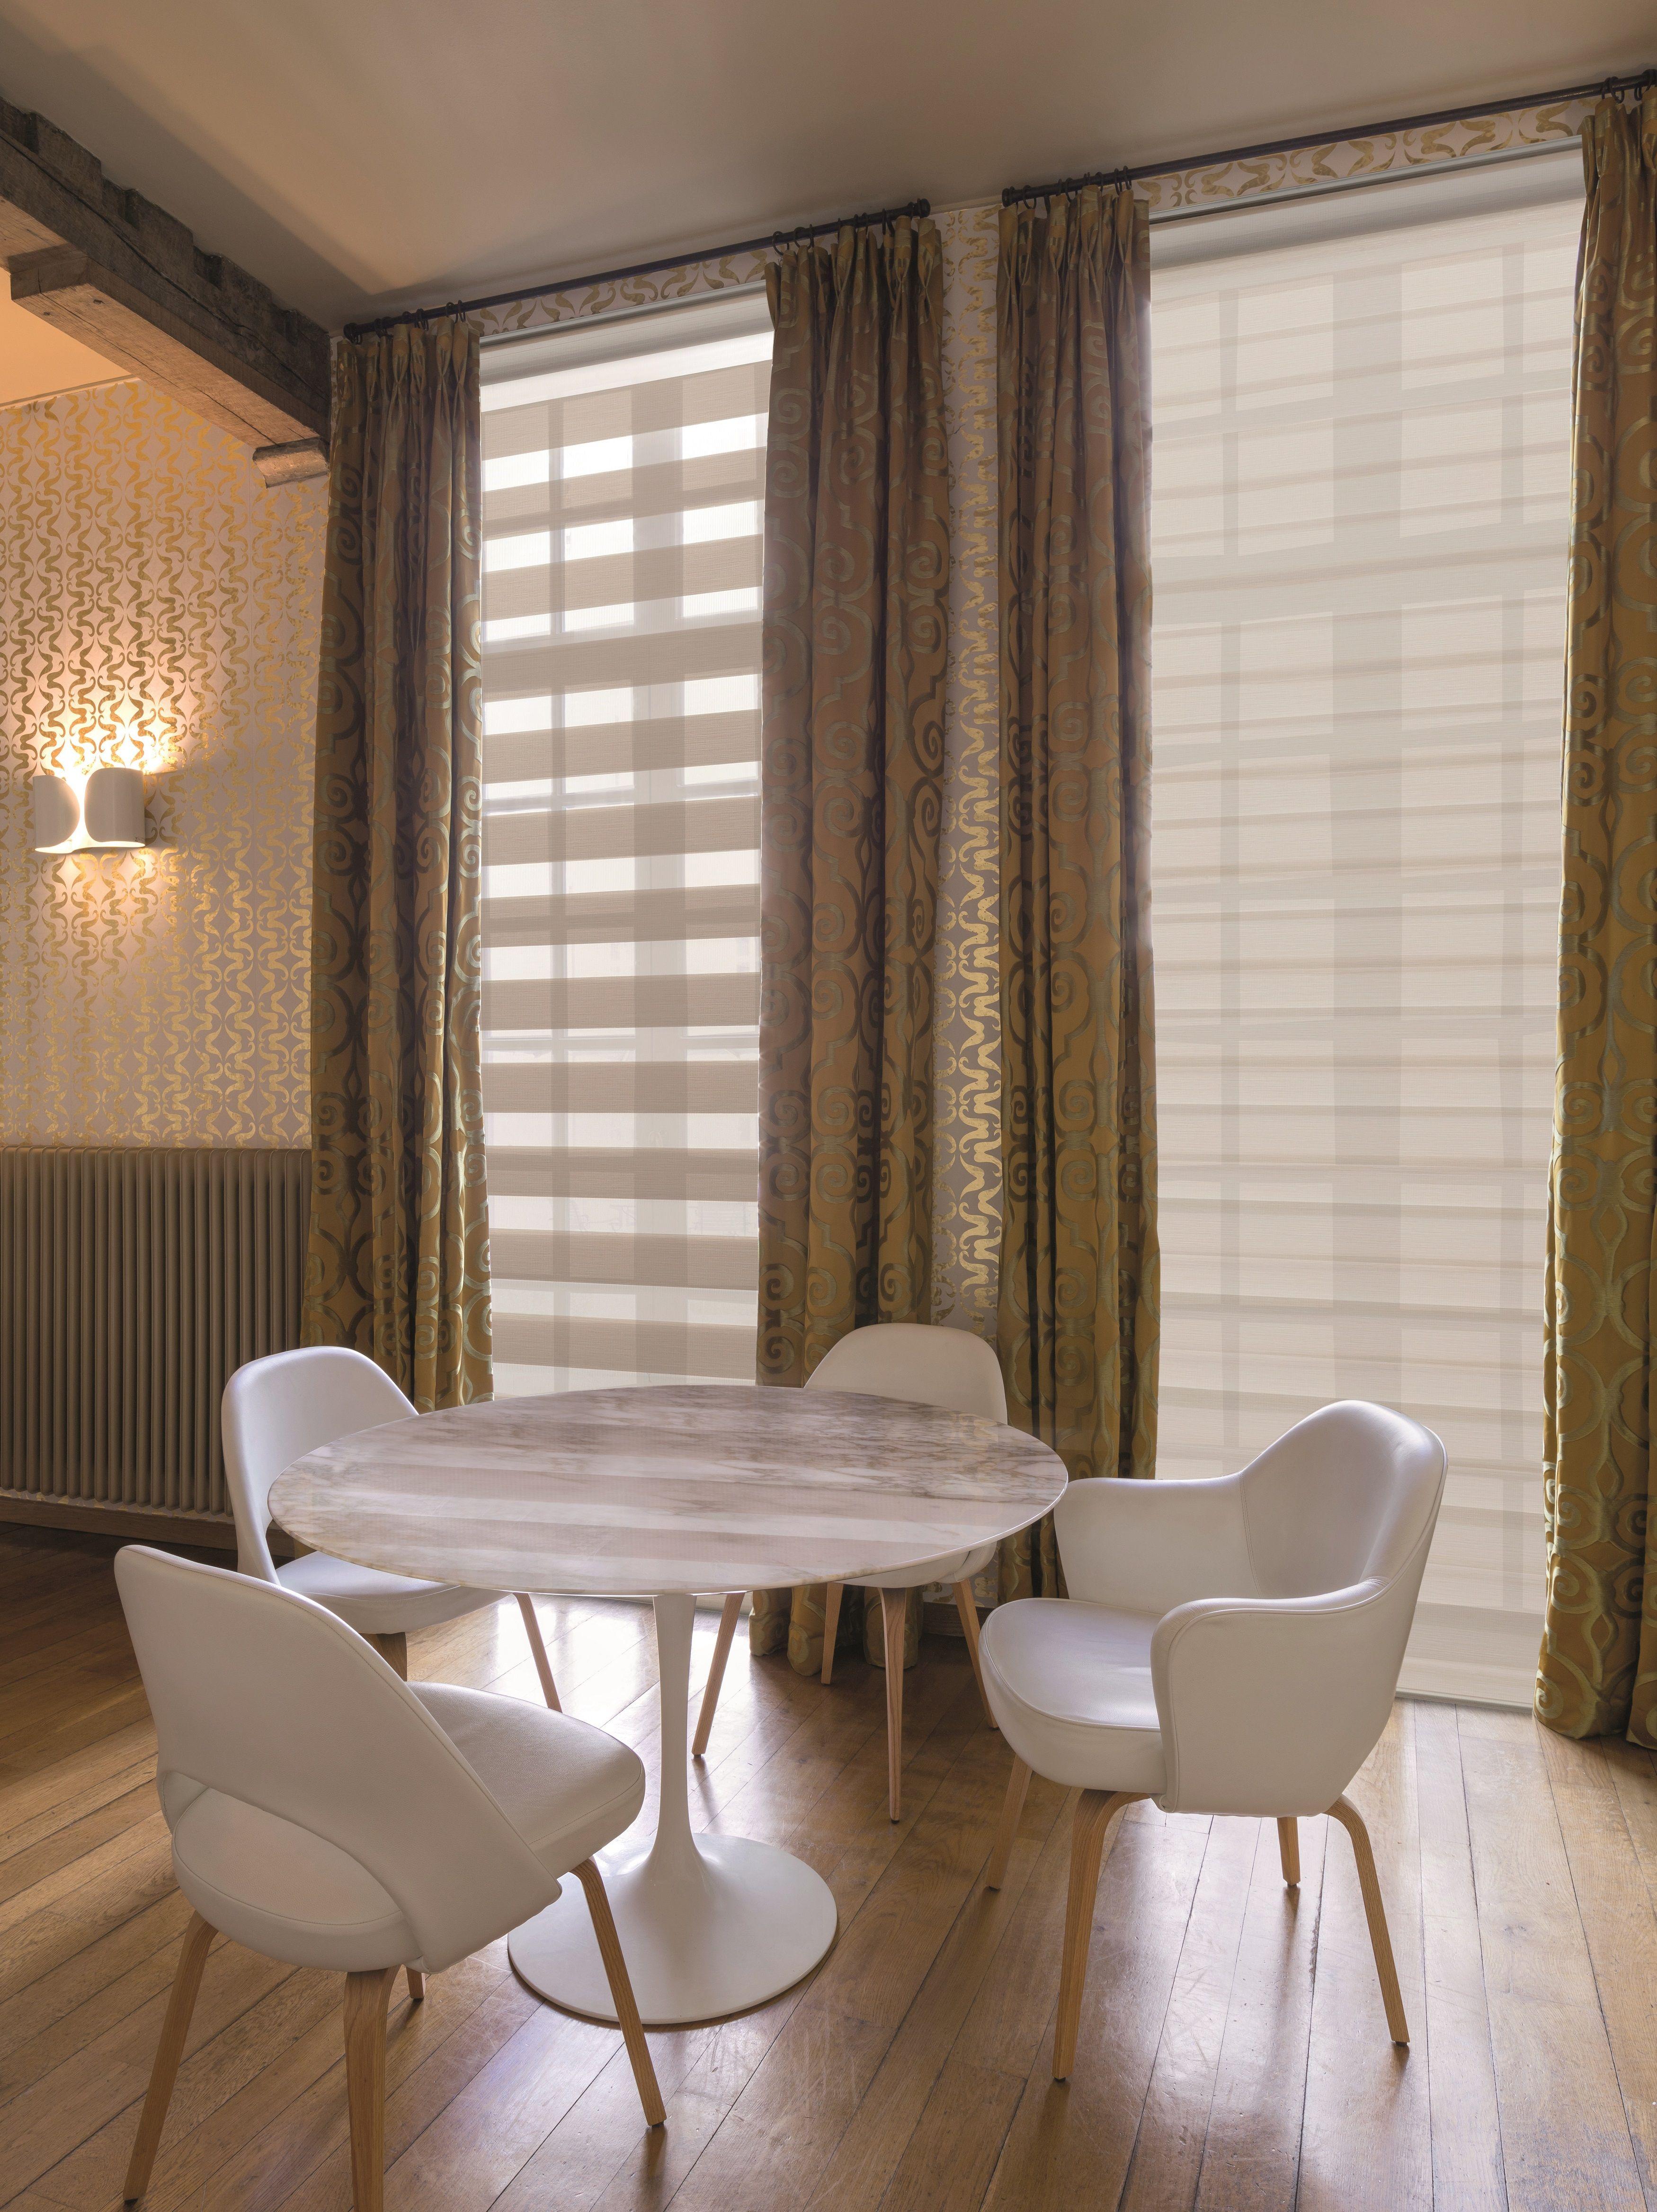 Copahome raamdecoratie duo rolgordijn offwhite beige for Decoration fenetre